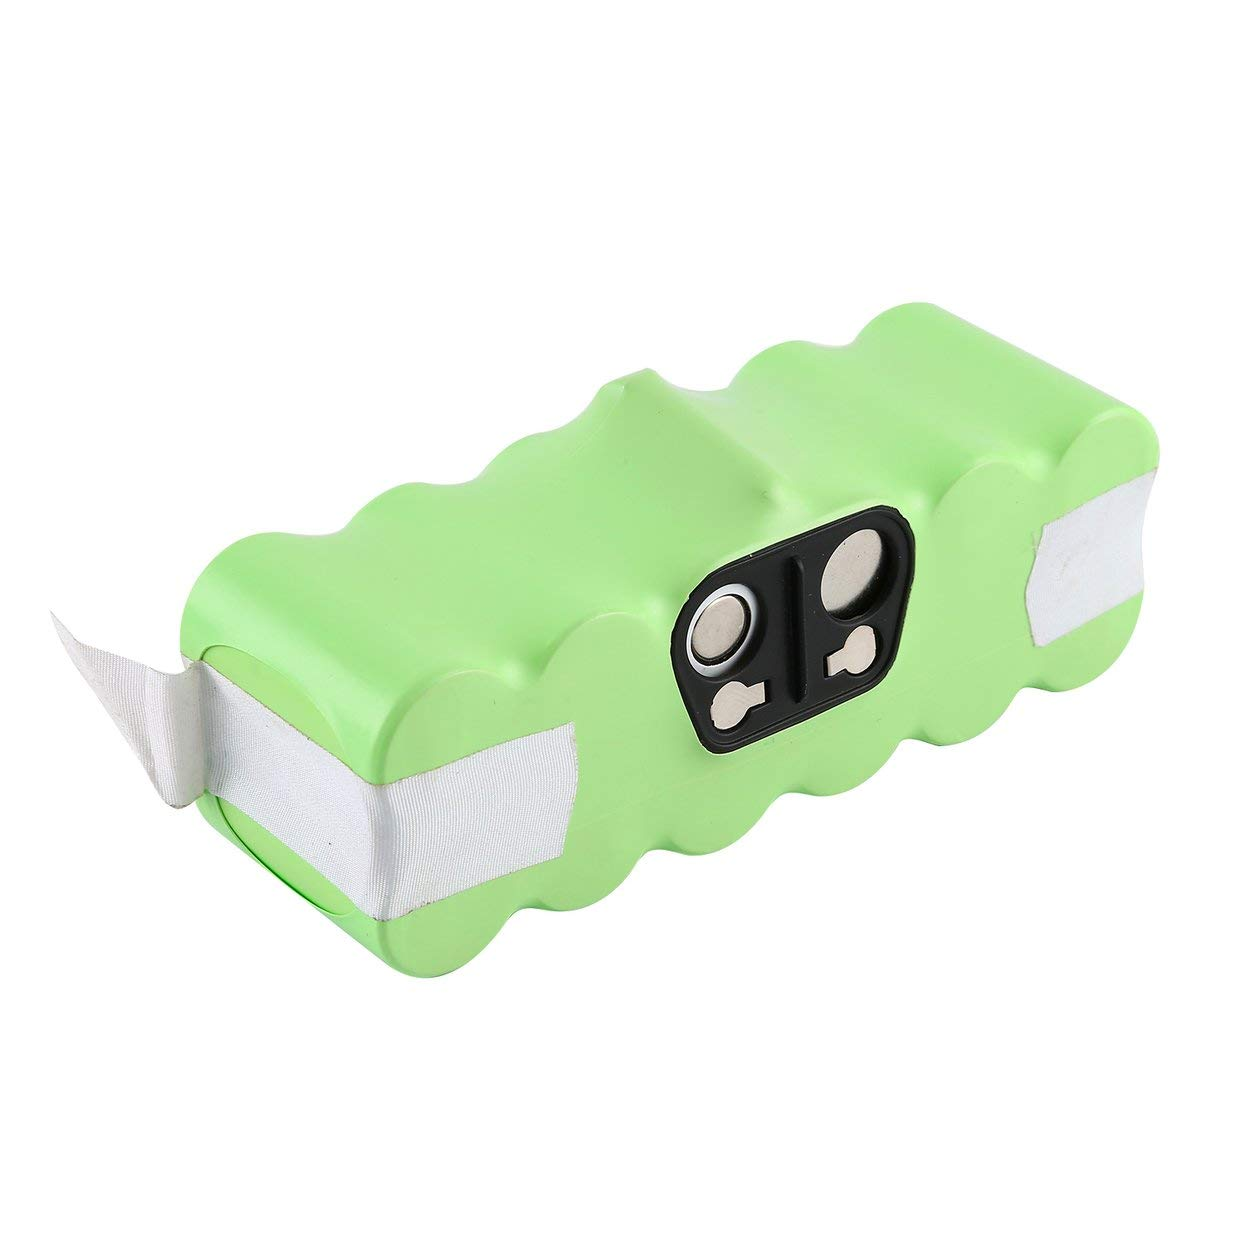 Batteria di alta capacit/à 14.4V 6200mAh Batteria NI-MH per iRobot Roomba Aspirapolvere 500 600 700 800 Series